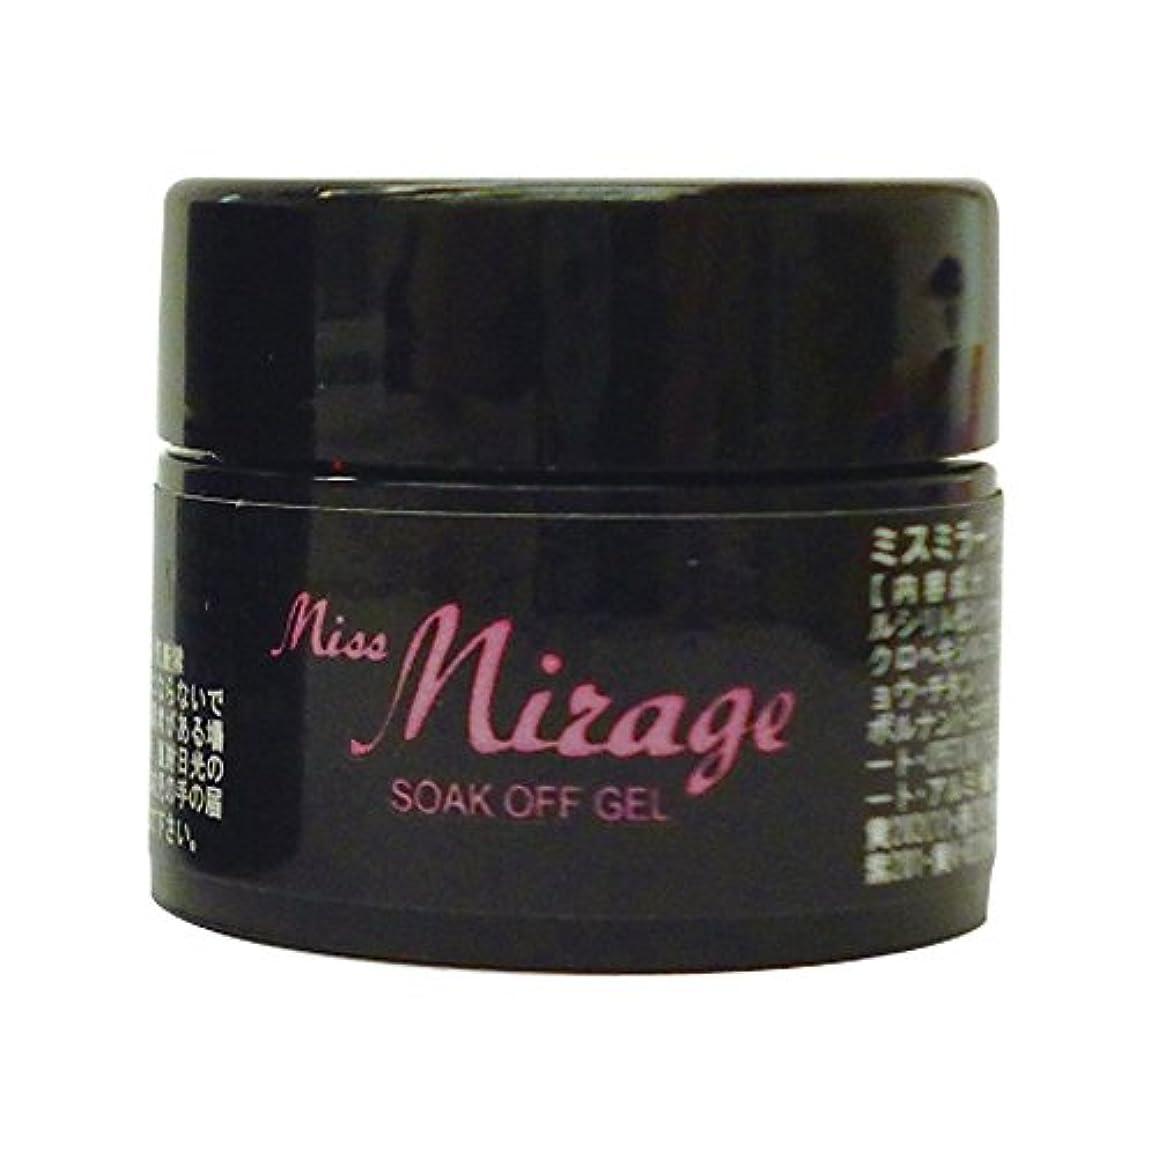 Miss Mirage ソークオフジェル TM16S 2.5g トゥルーリーチェリーベージュ